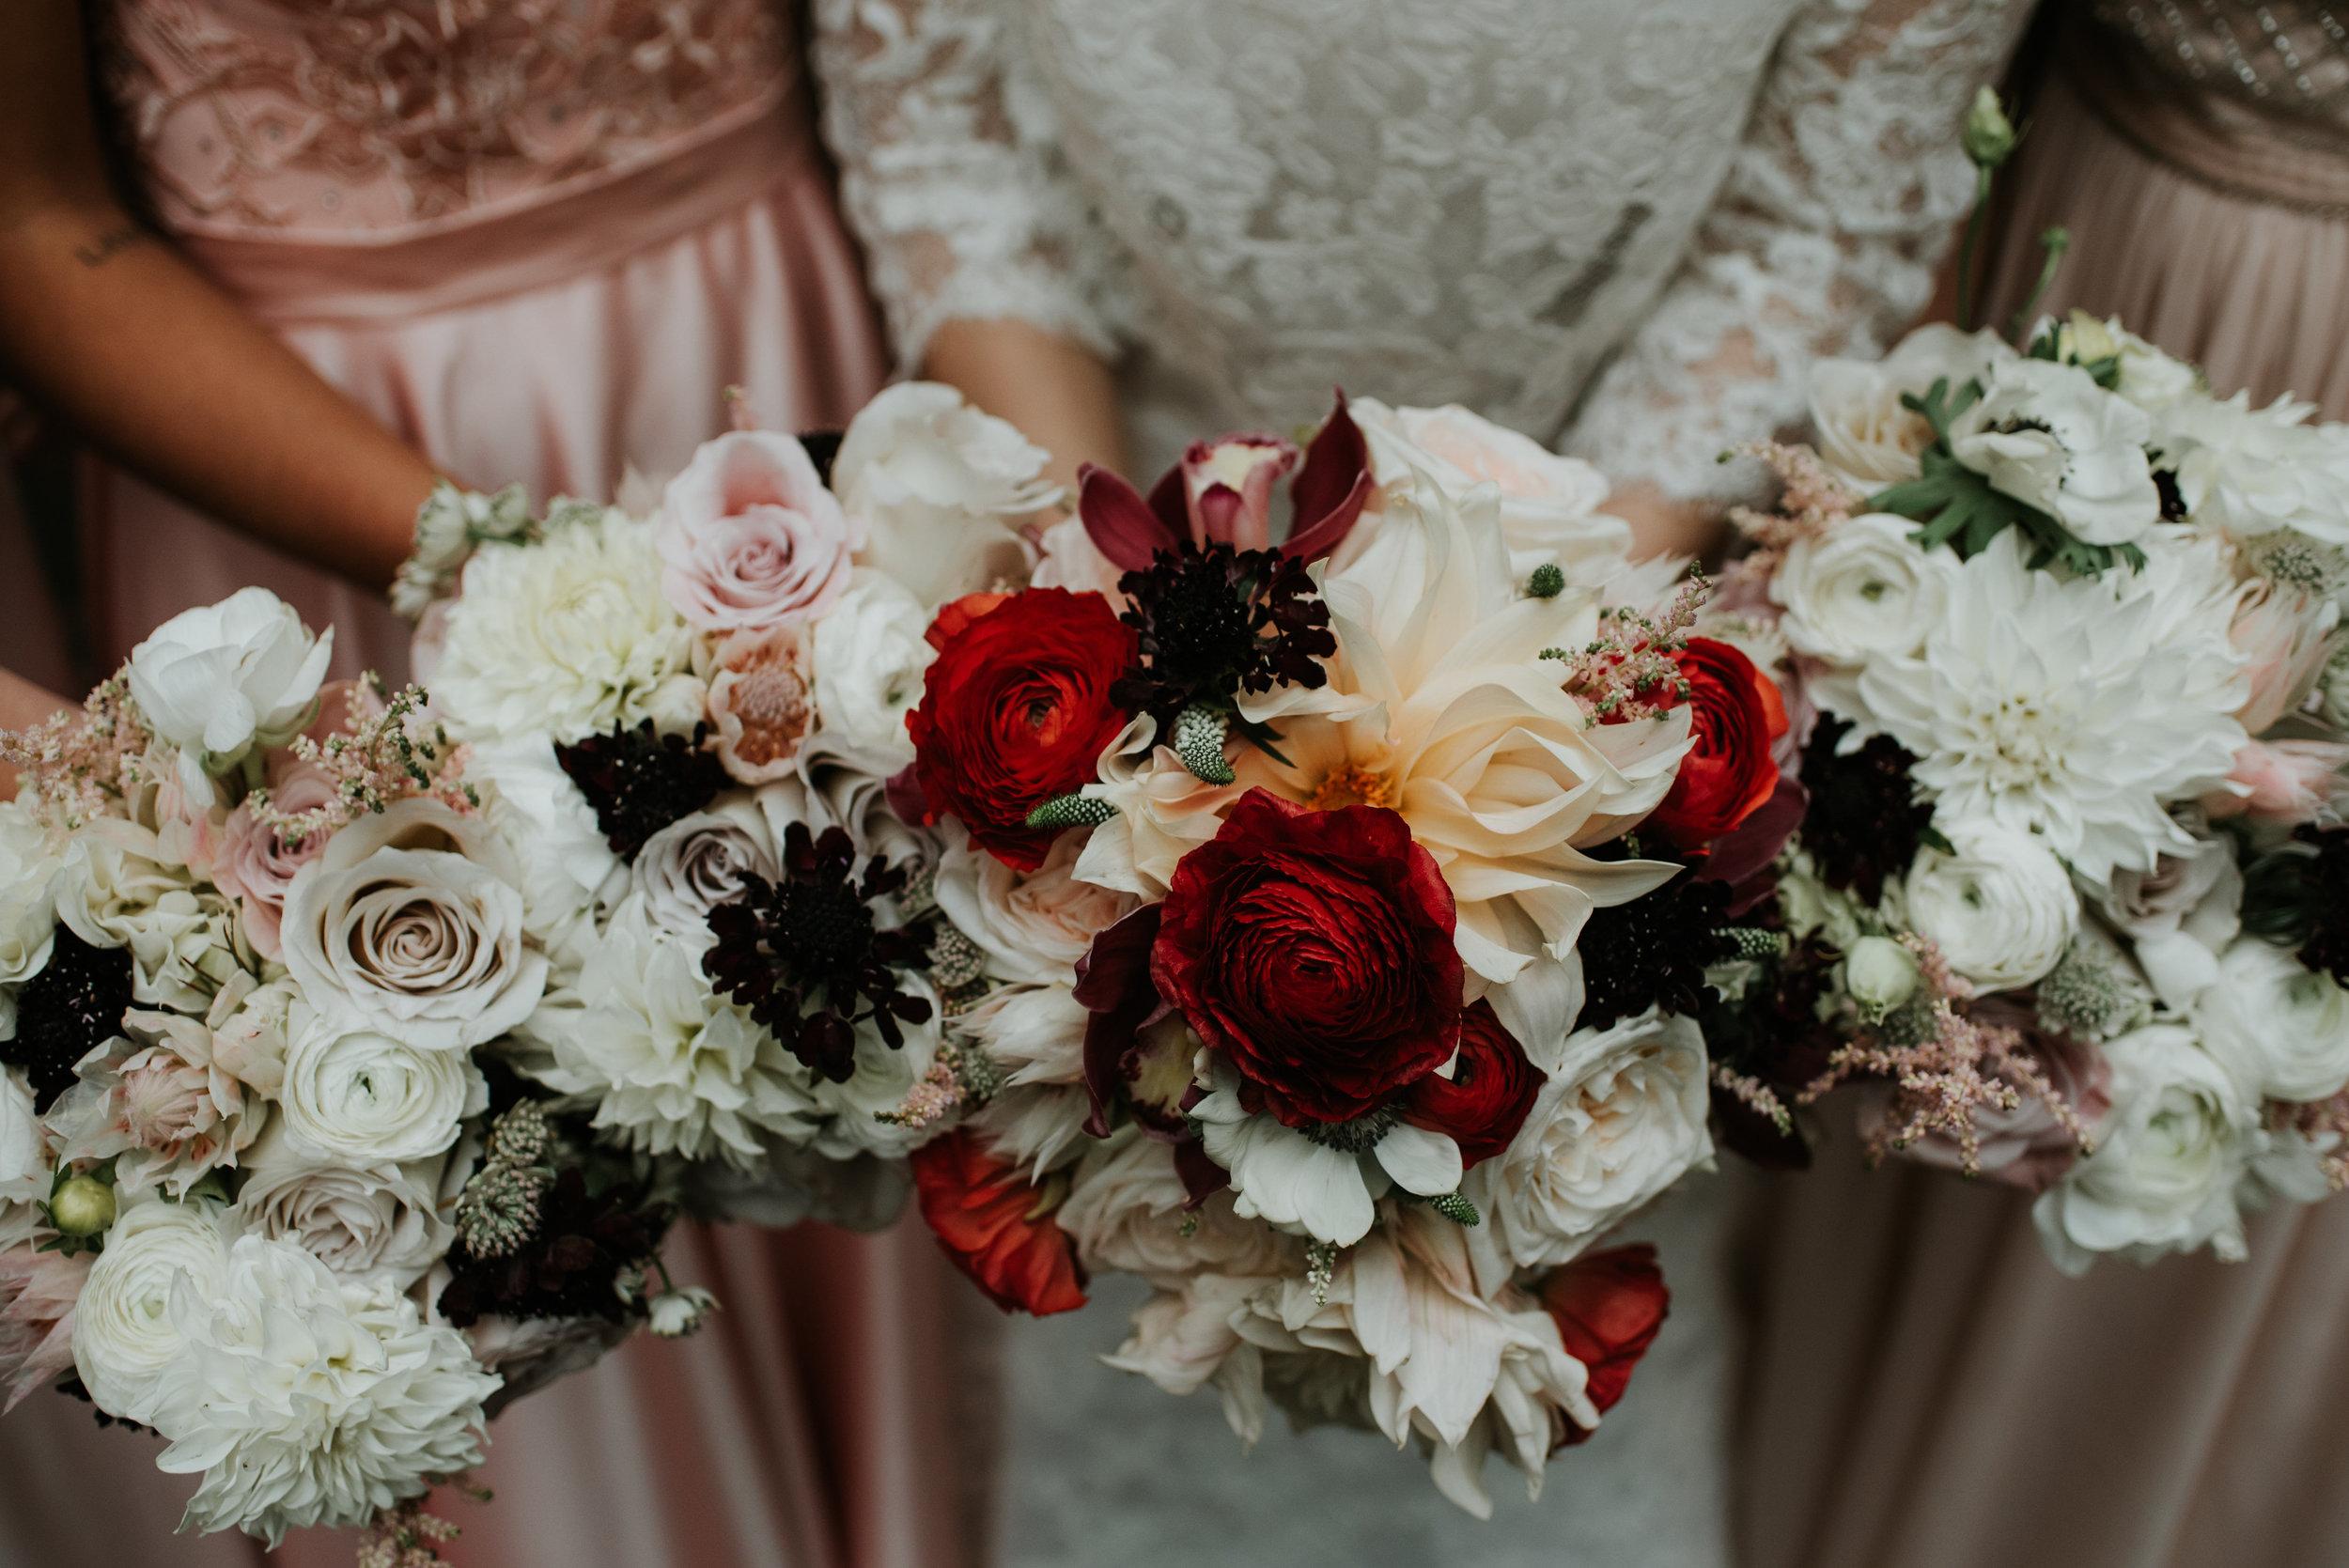 10 08 2017 Jessie and Matthew Daniel-05 Bridal Party-0050.jpg